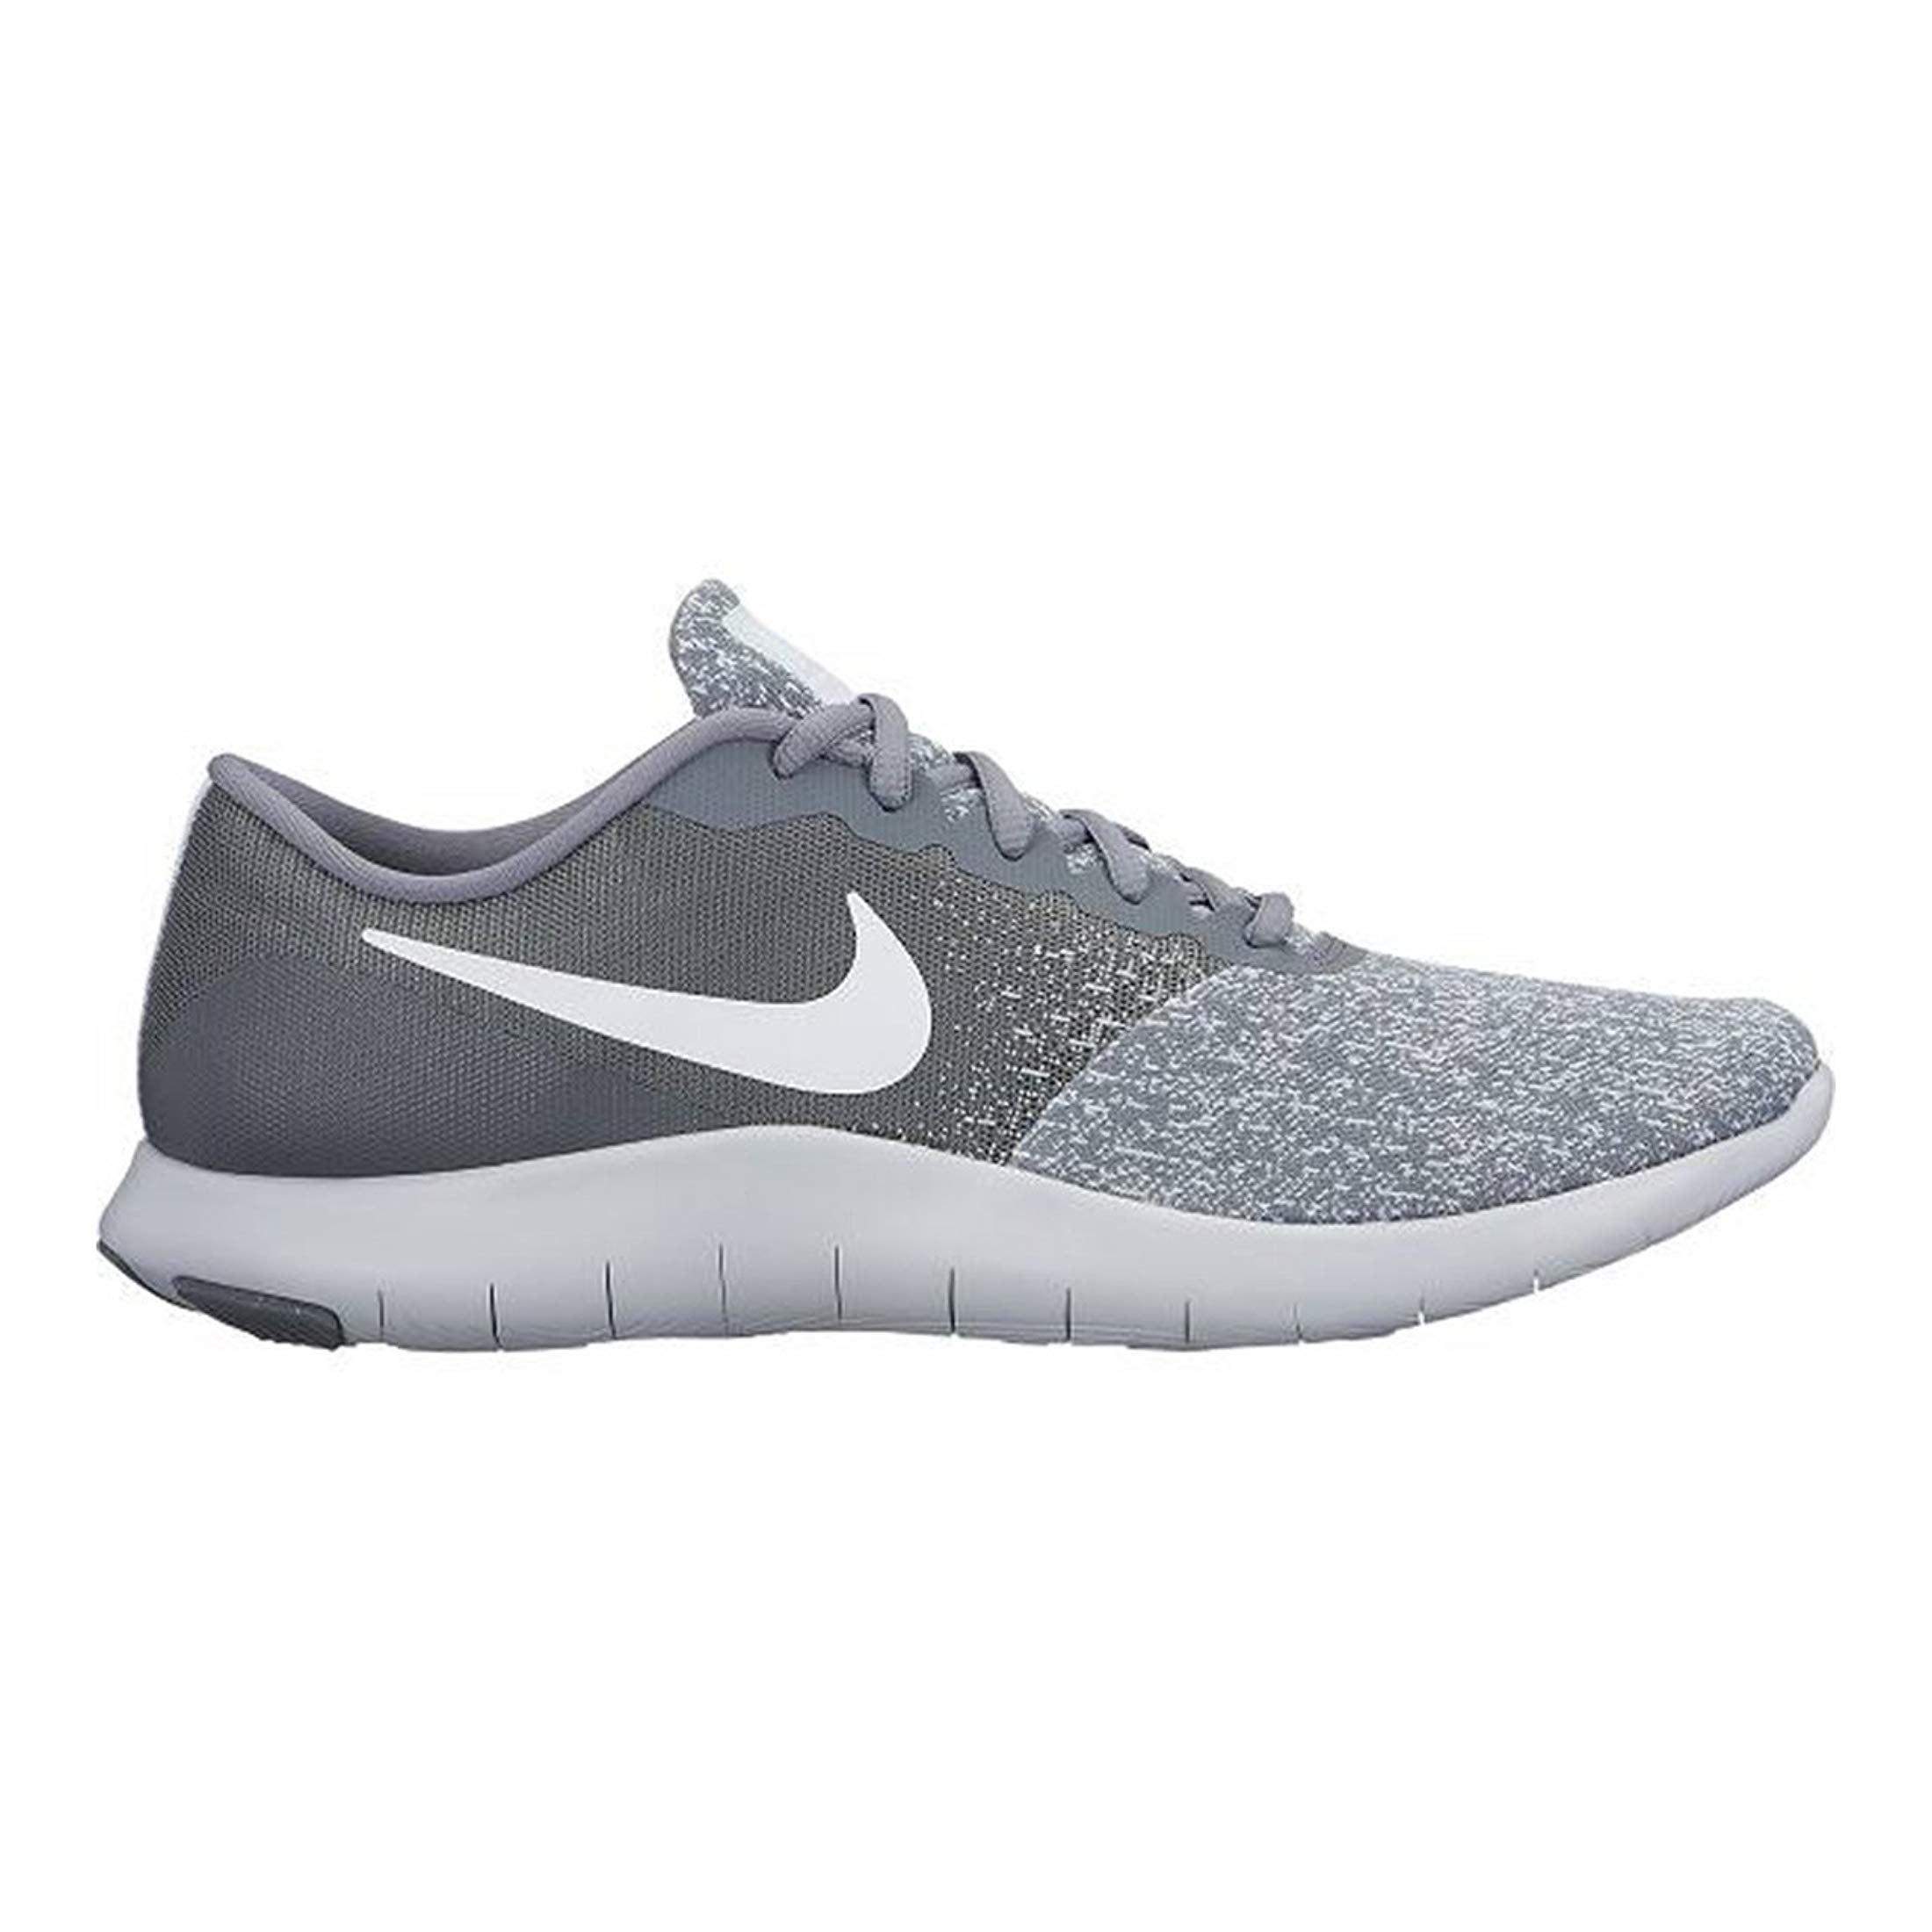 Shop Black Friday Deals on Nike Flex